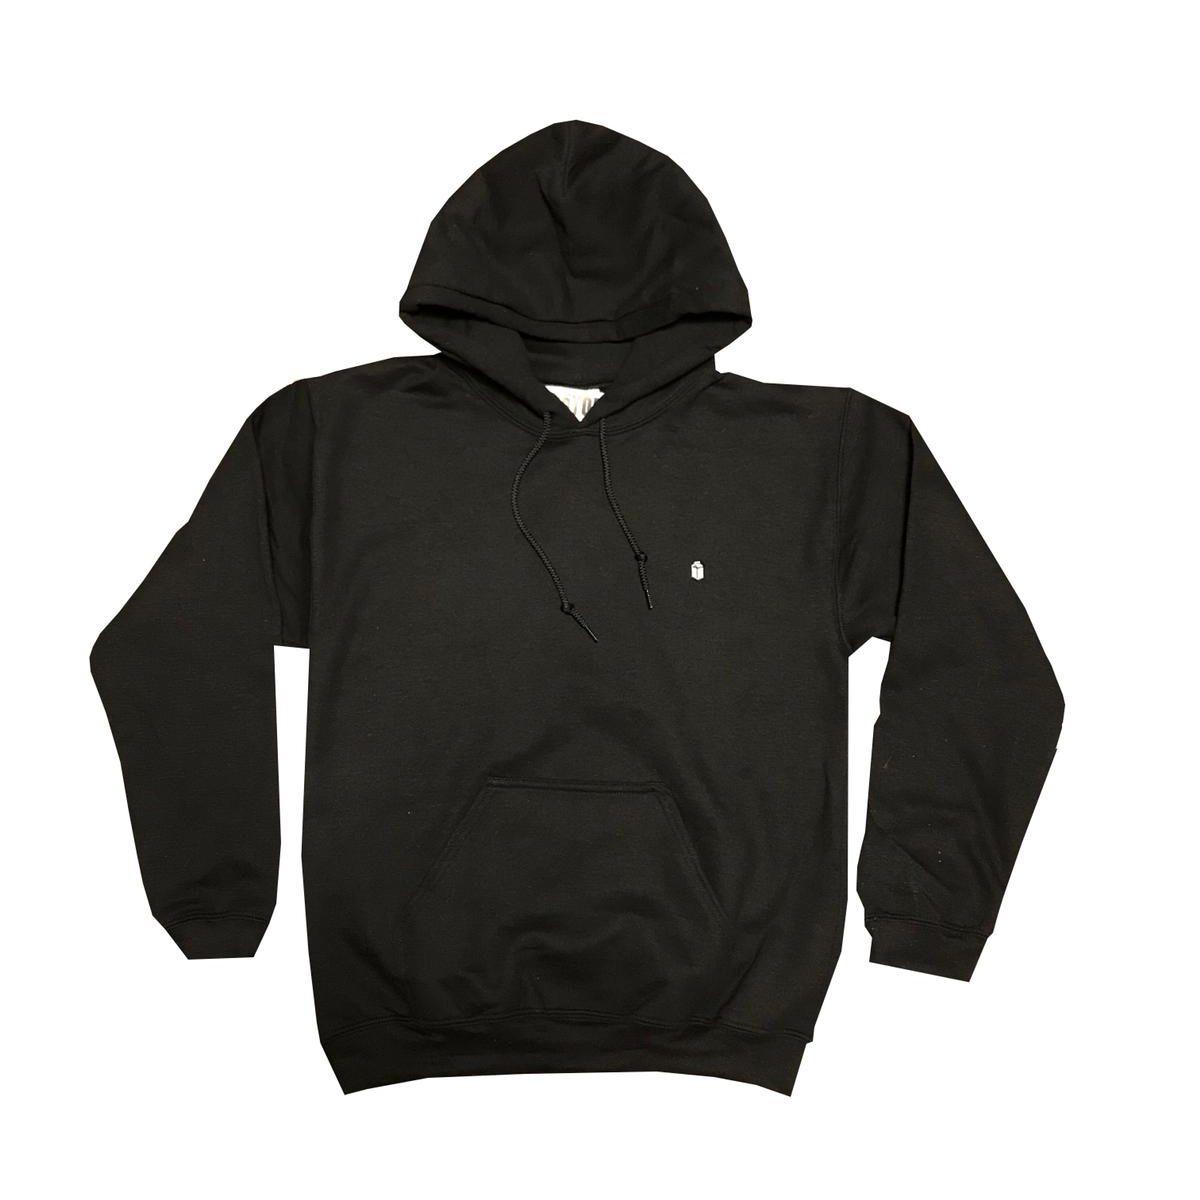 SoYou Clothing Basics Hoodie in Black